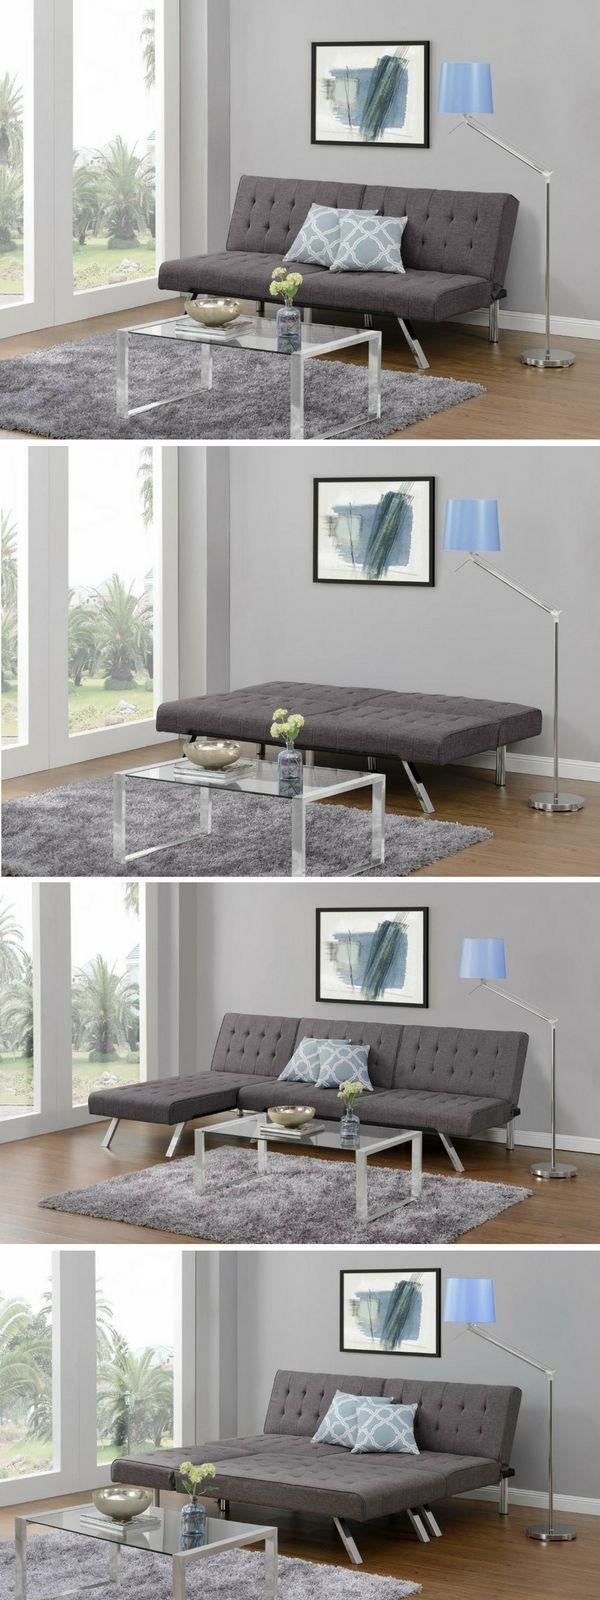 10 Futon Bedroom Ideas Stylish and also Beautiful